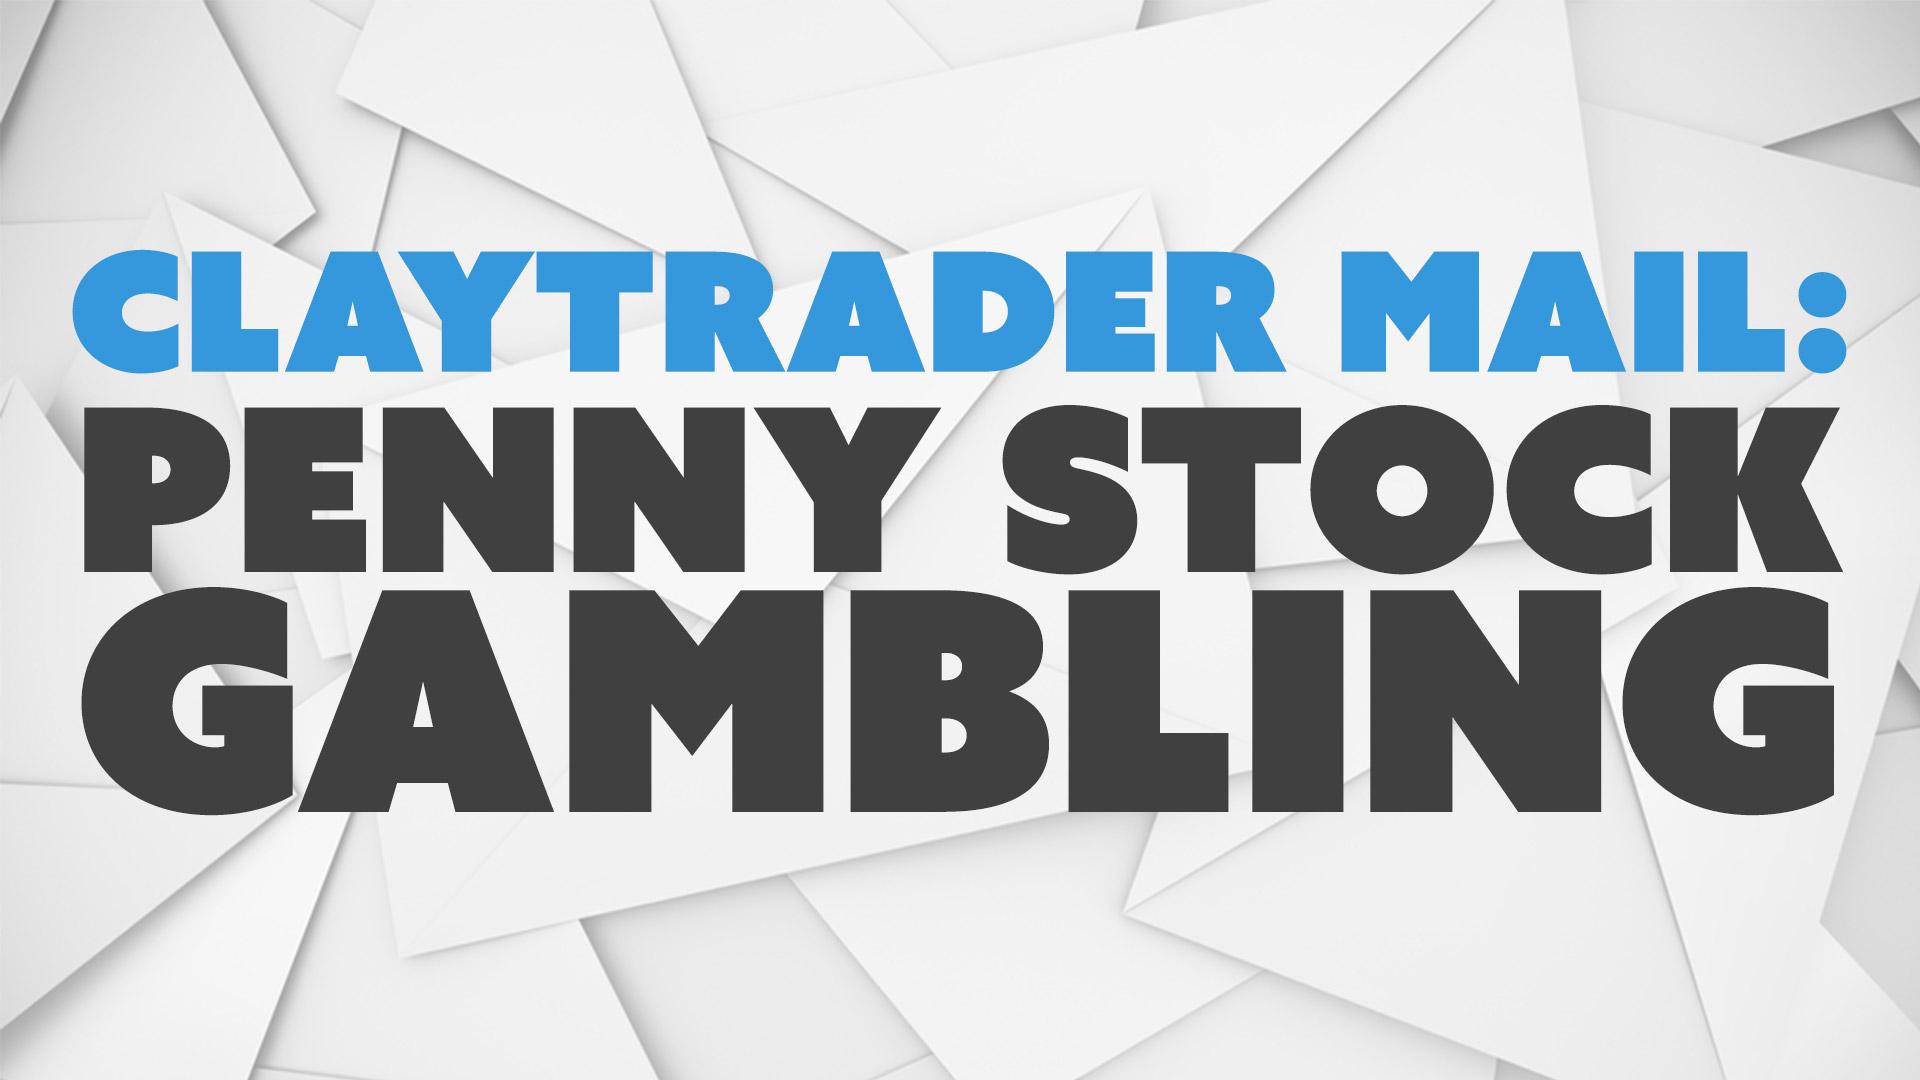 Penny Stock Gambling